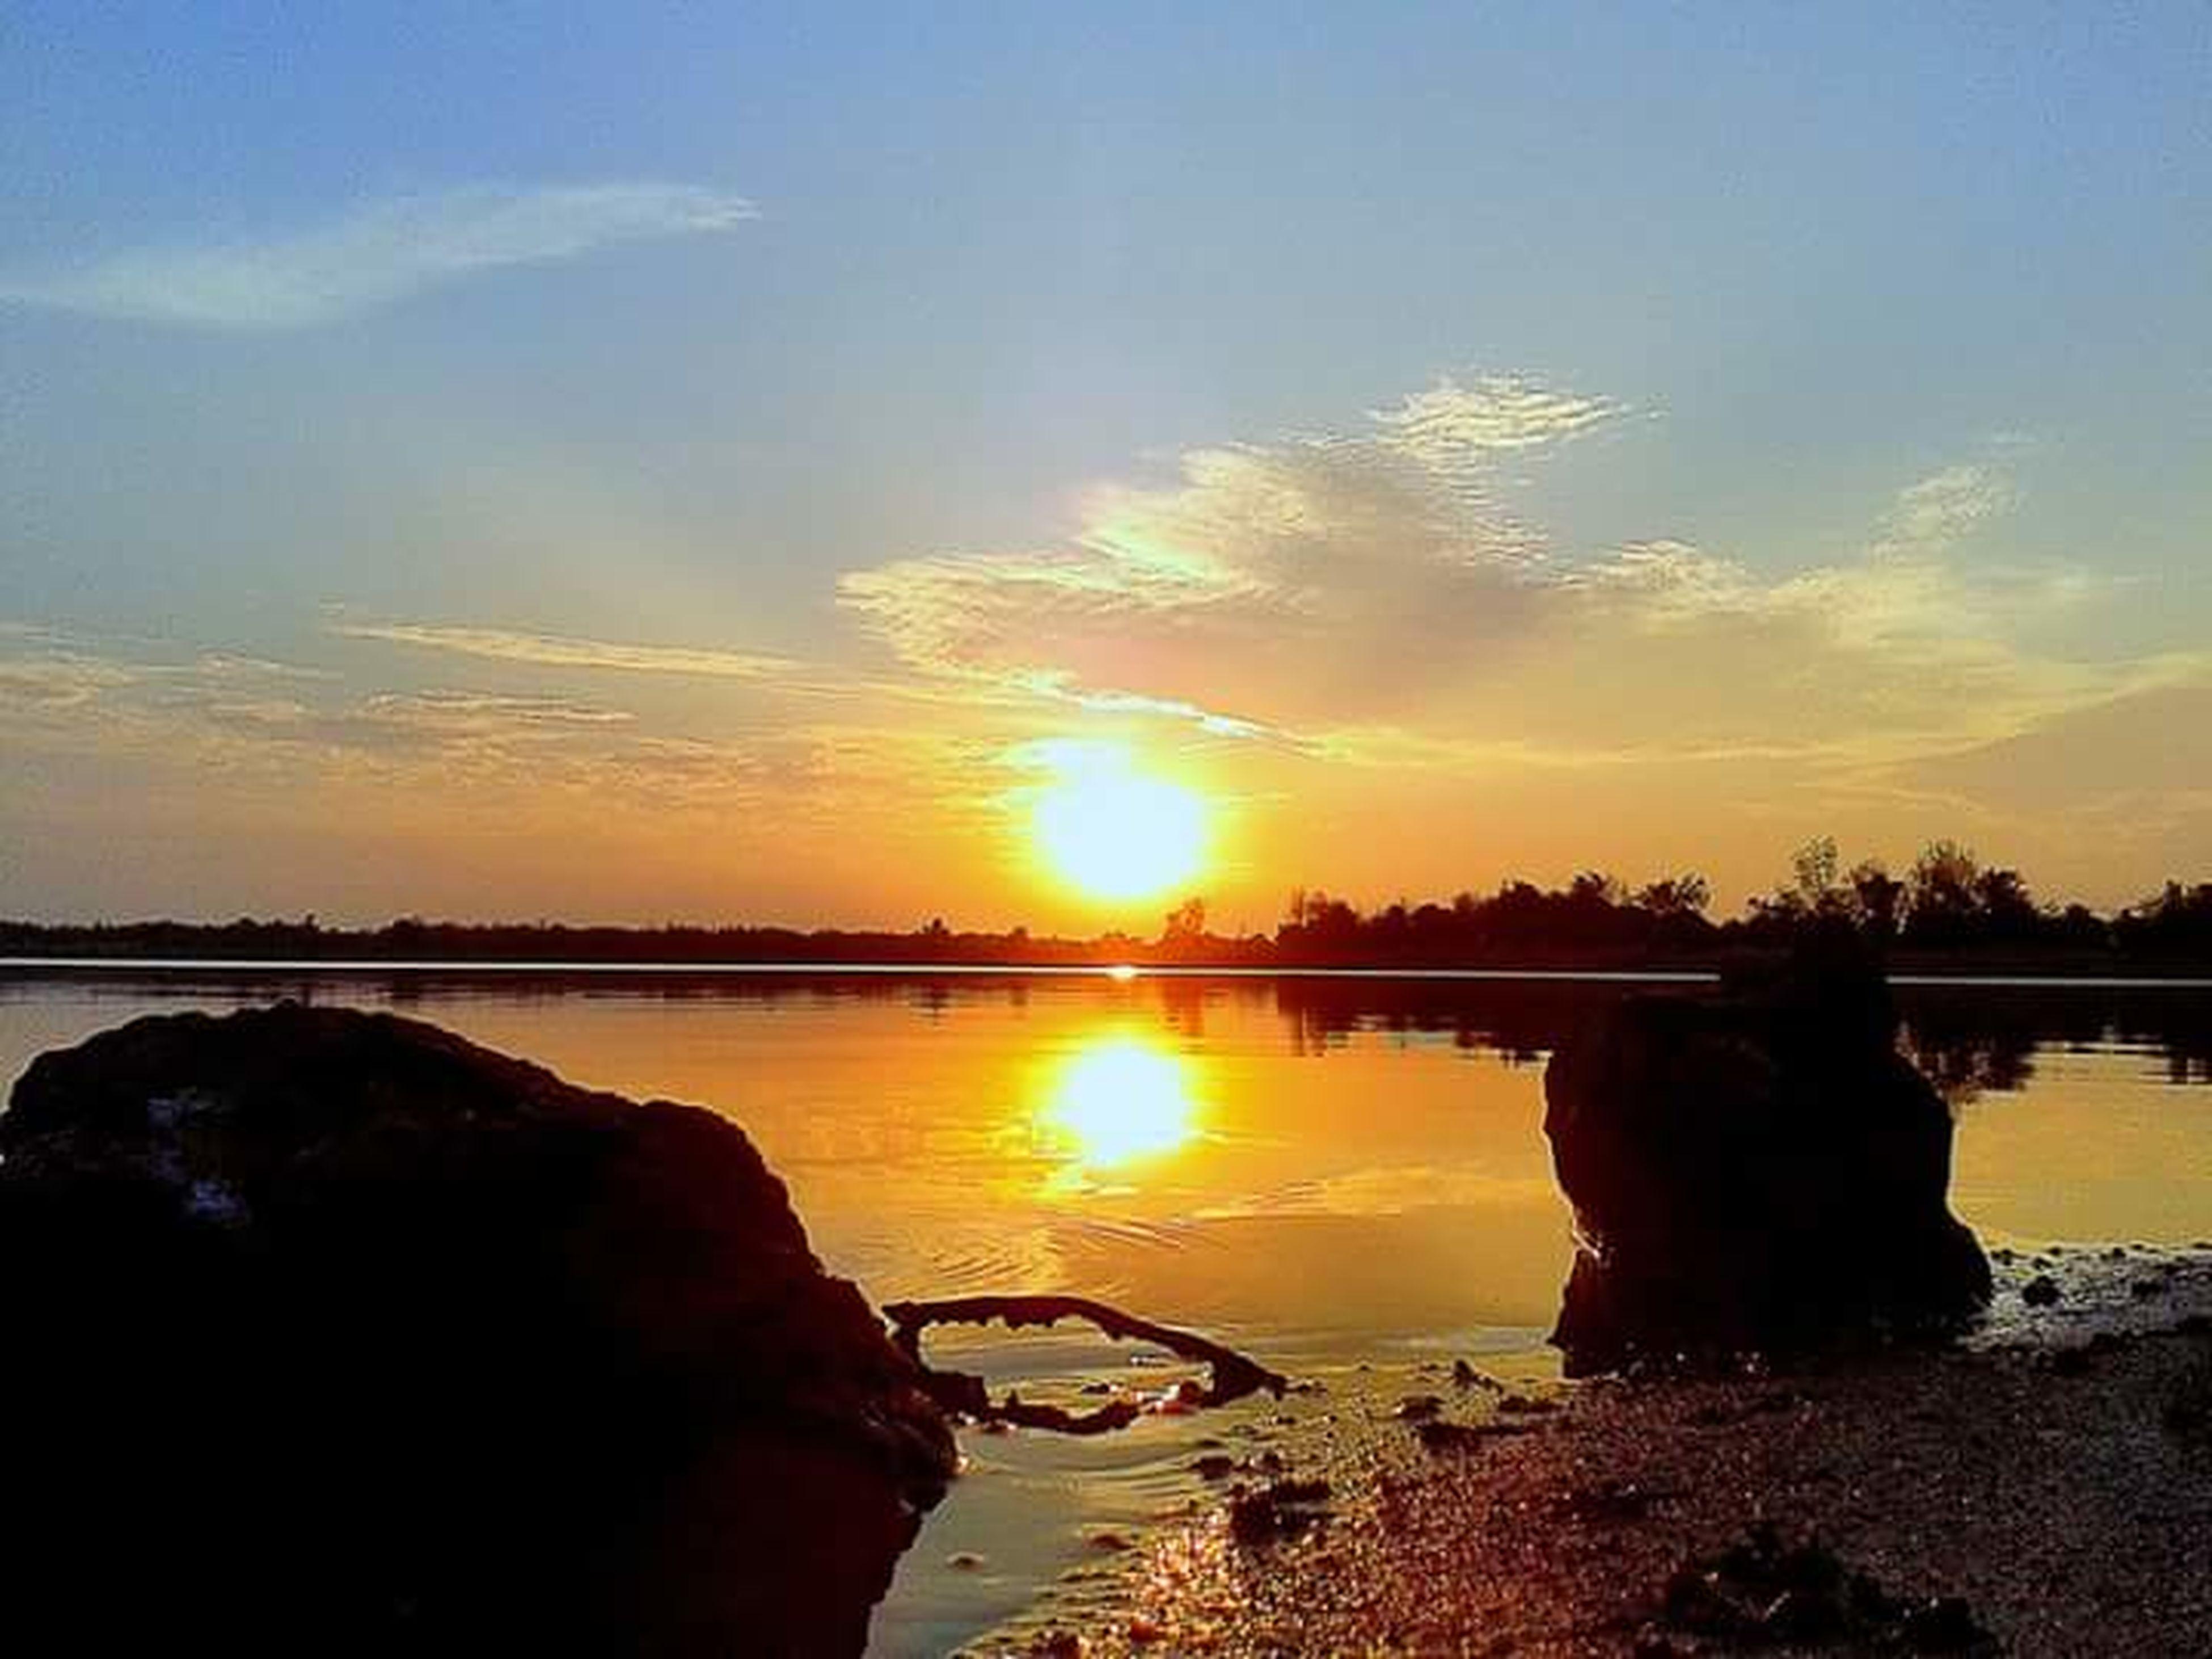 sunset, water, sun, sky, reflection, scenics, tranquil scene, tranquility, beauty in nature, rock - object, silhouette, nature, orange color, sea, sunlight, idyllic, beach, cloud - sky, shore, lake